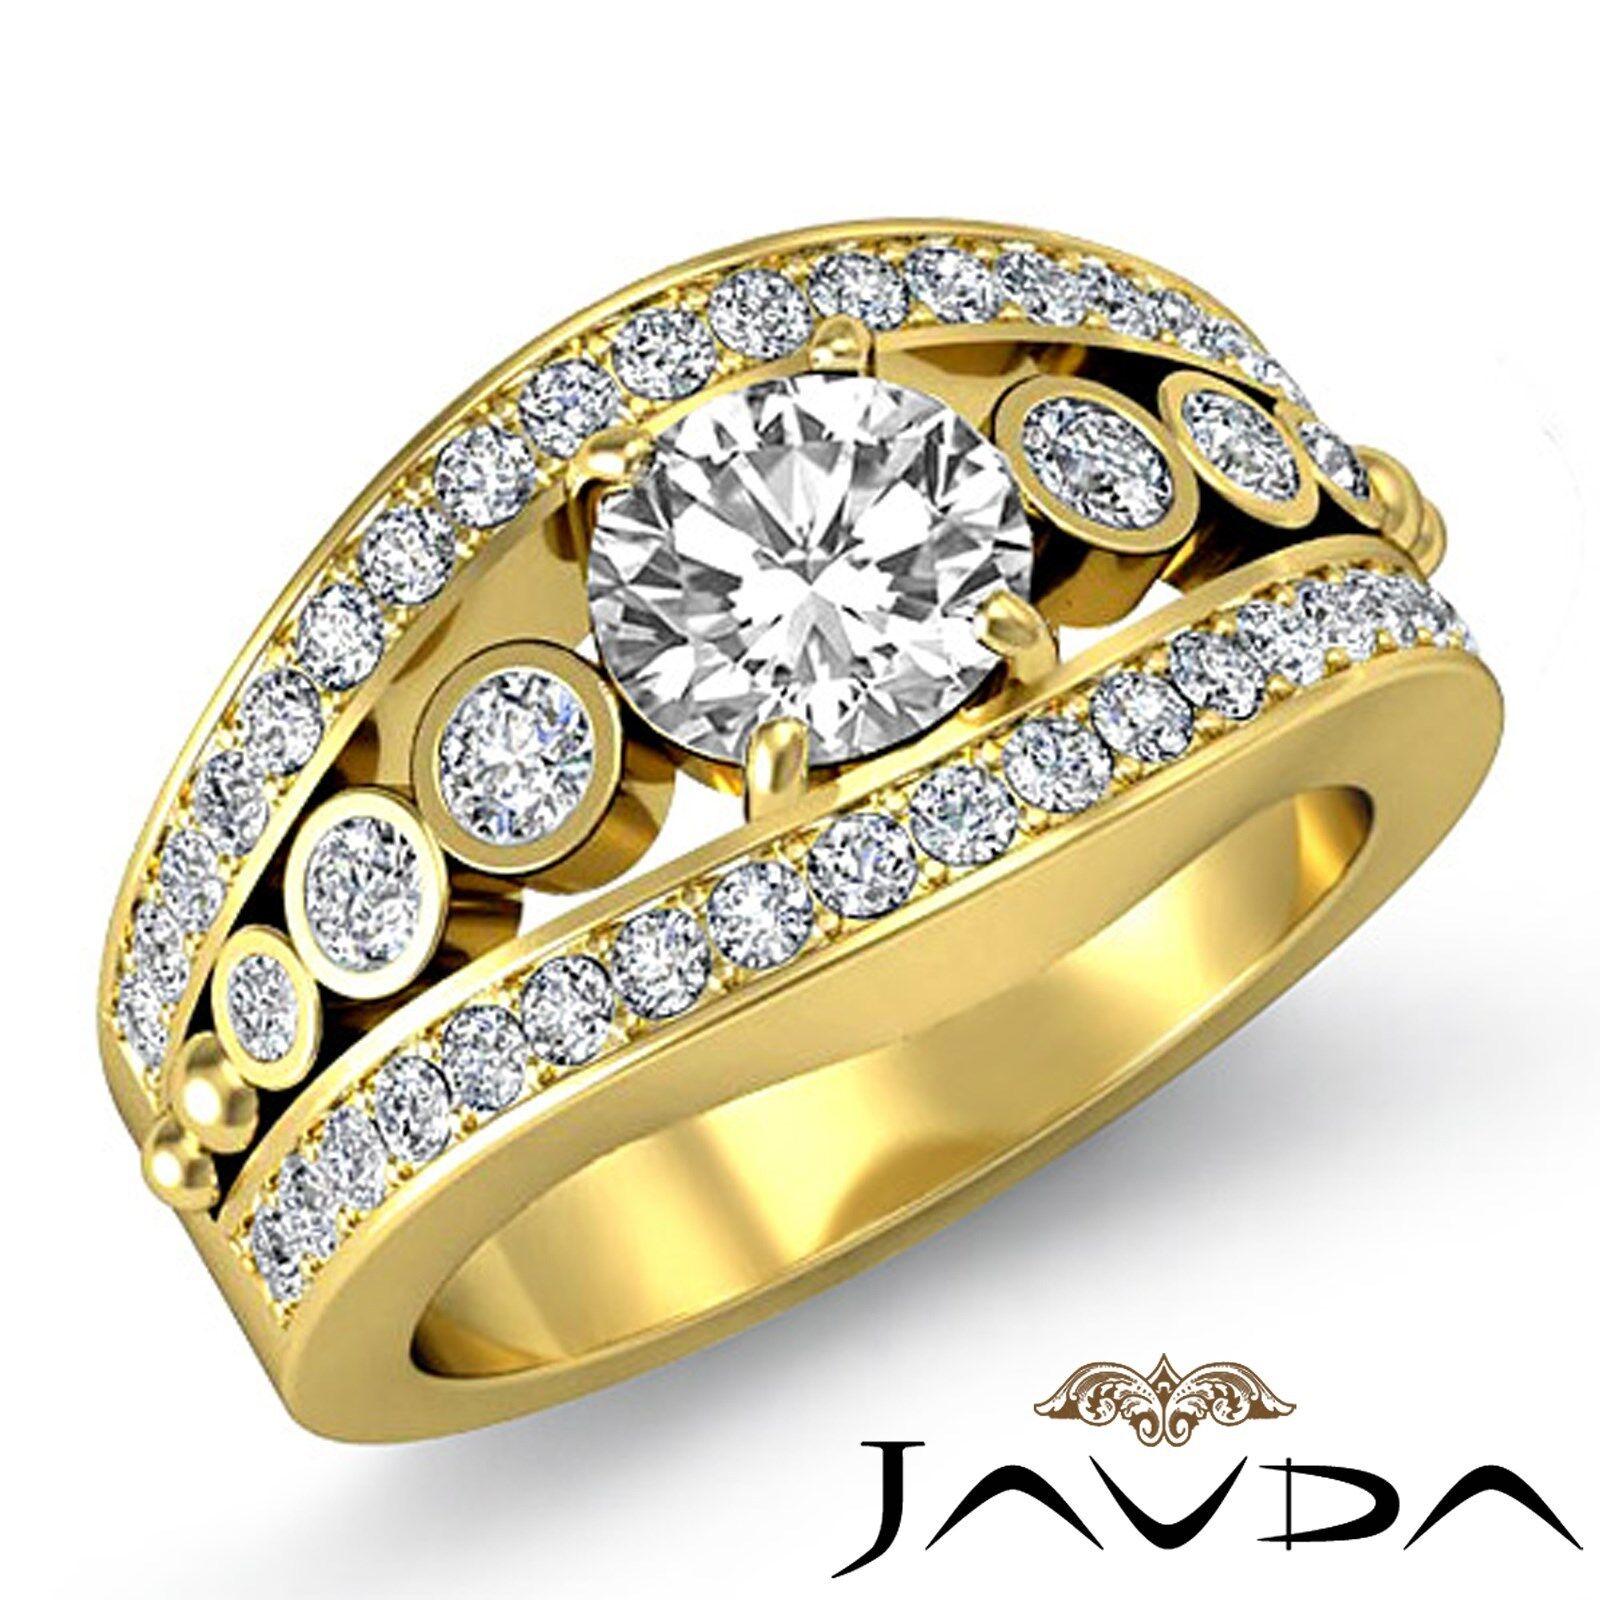 Micro Pave Bezel Setting Round Diamond Engagement Wedding Ring GIA F VS2 2.25Ct